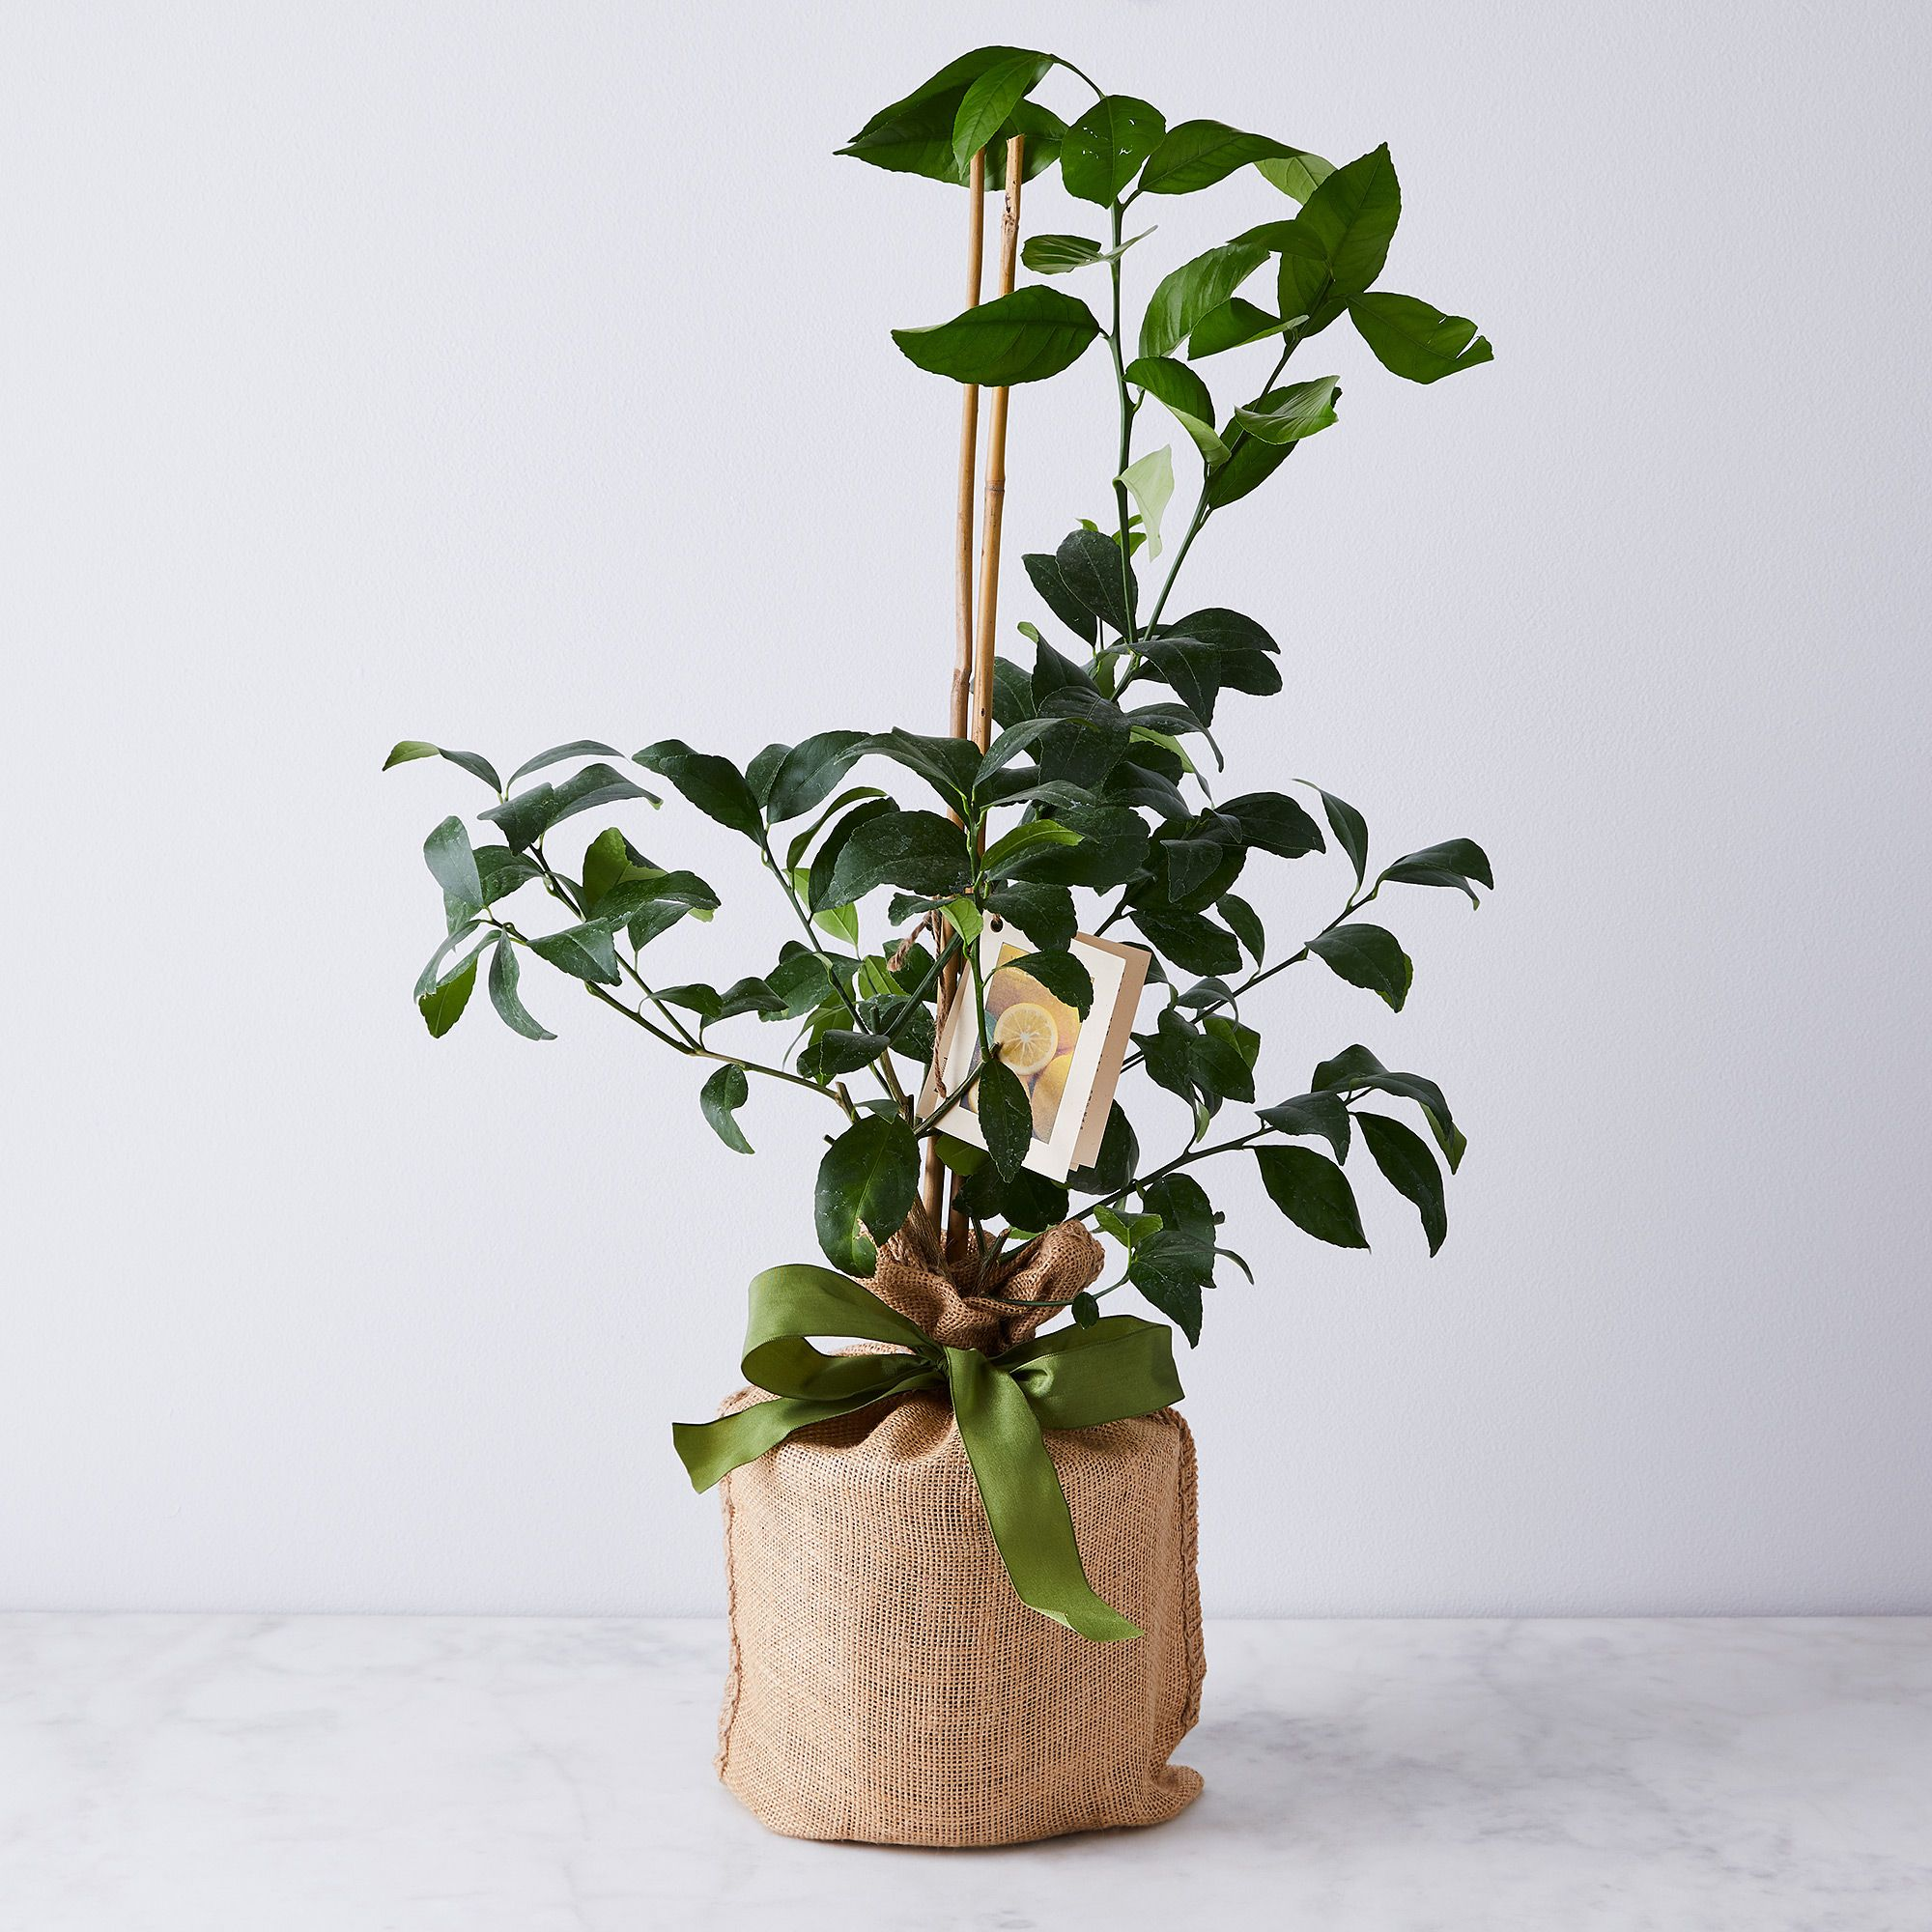 0f358cd7-fc2c-46d8-9b7c-7af977890c4e–2020-0129_magnolia-company_citrus-trees_meyer-lemon-tree_silo_ty-mecham